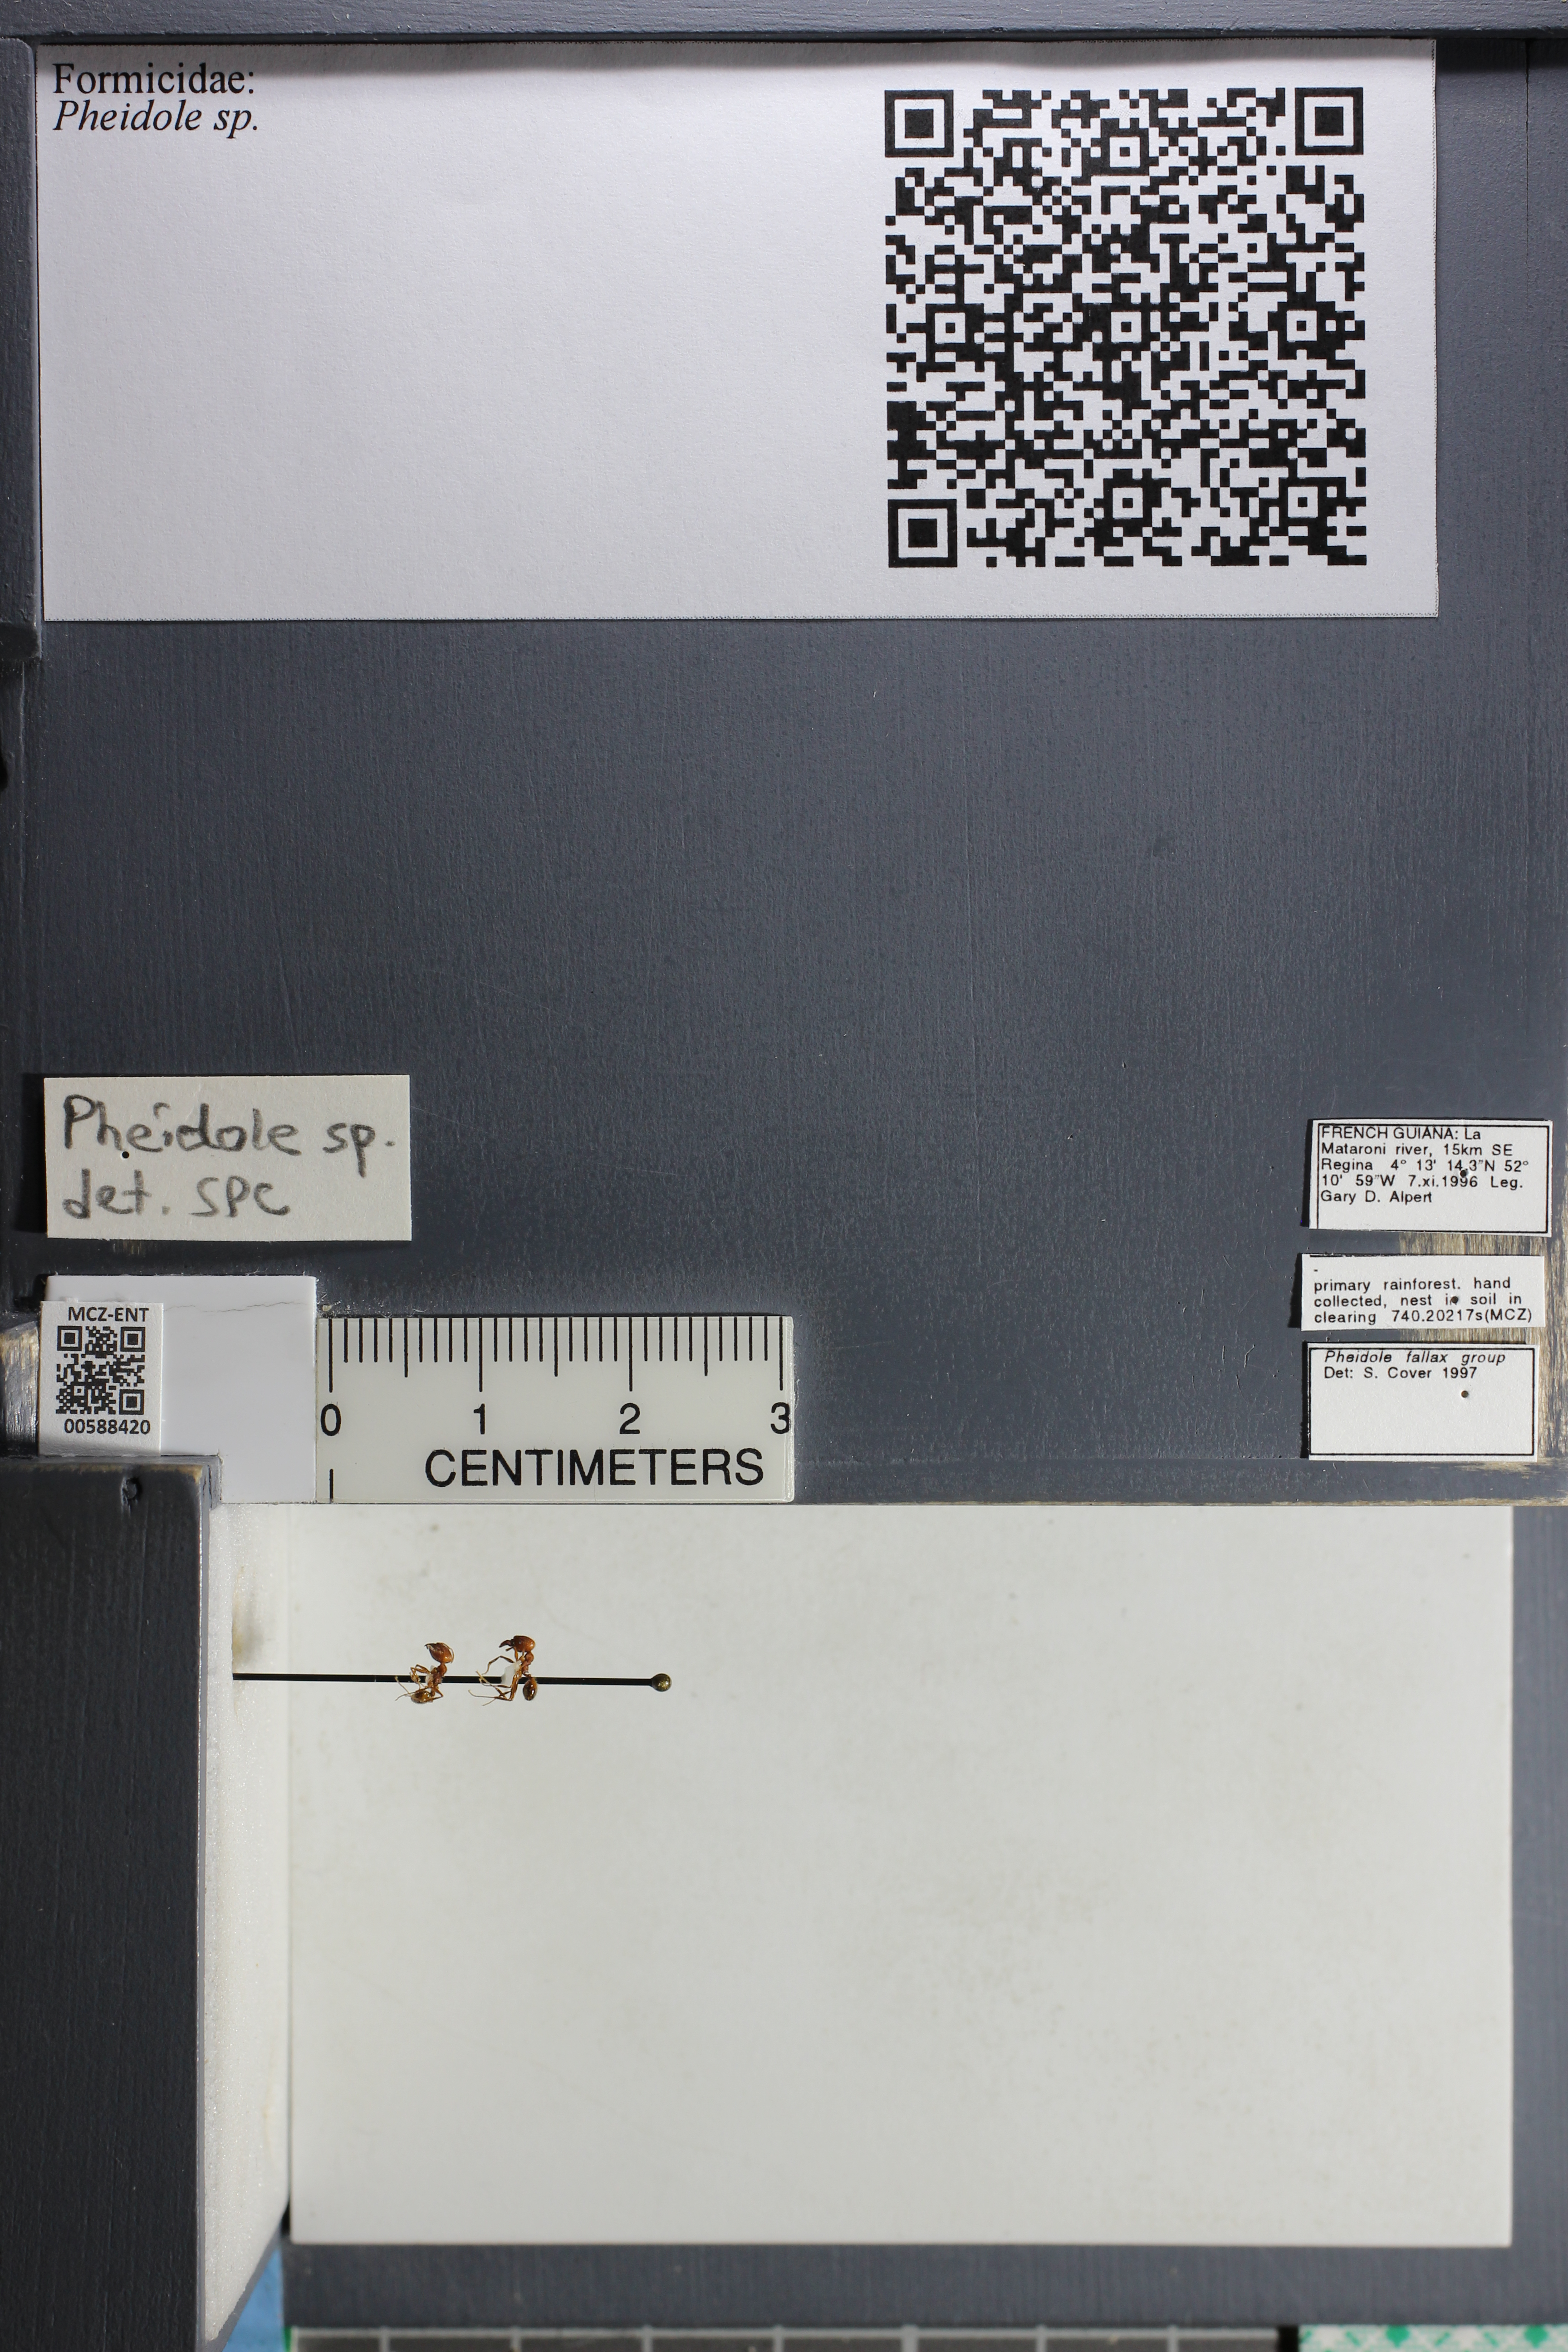 Media of type image, MCZ:Ent:588420 Identified as Pheidole sp..